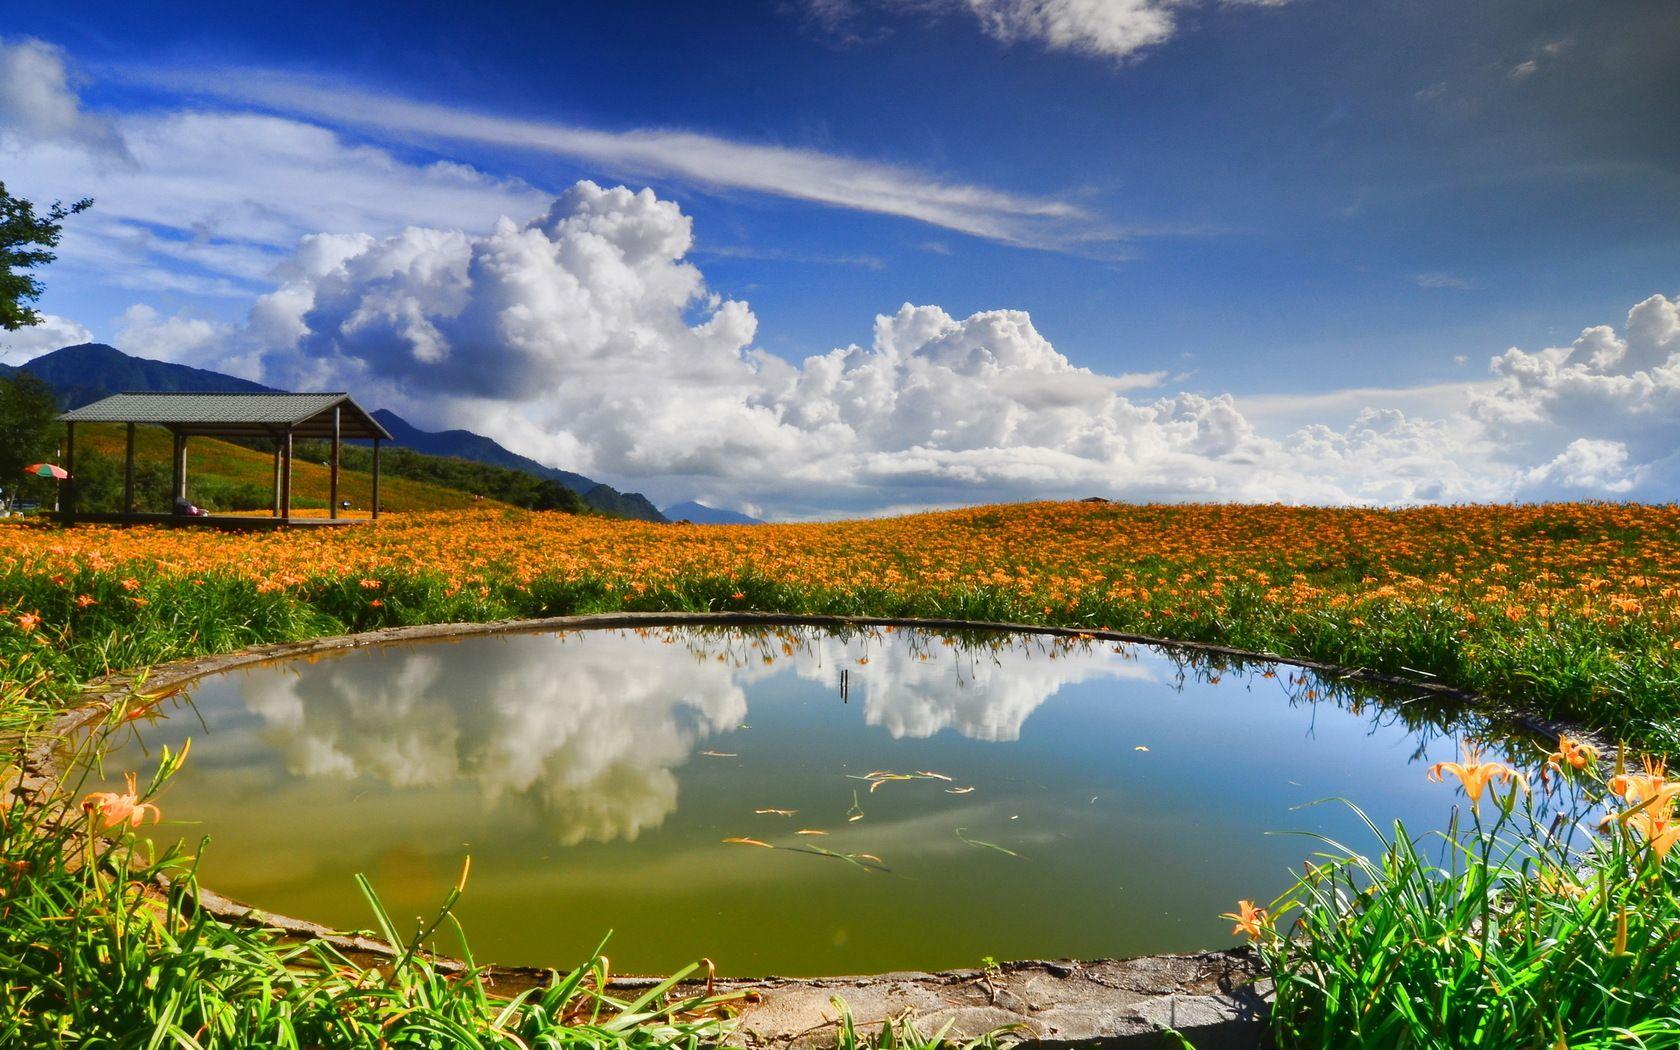 Round Pond Landscape Wallpaper Hd Landscape Nature Photography